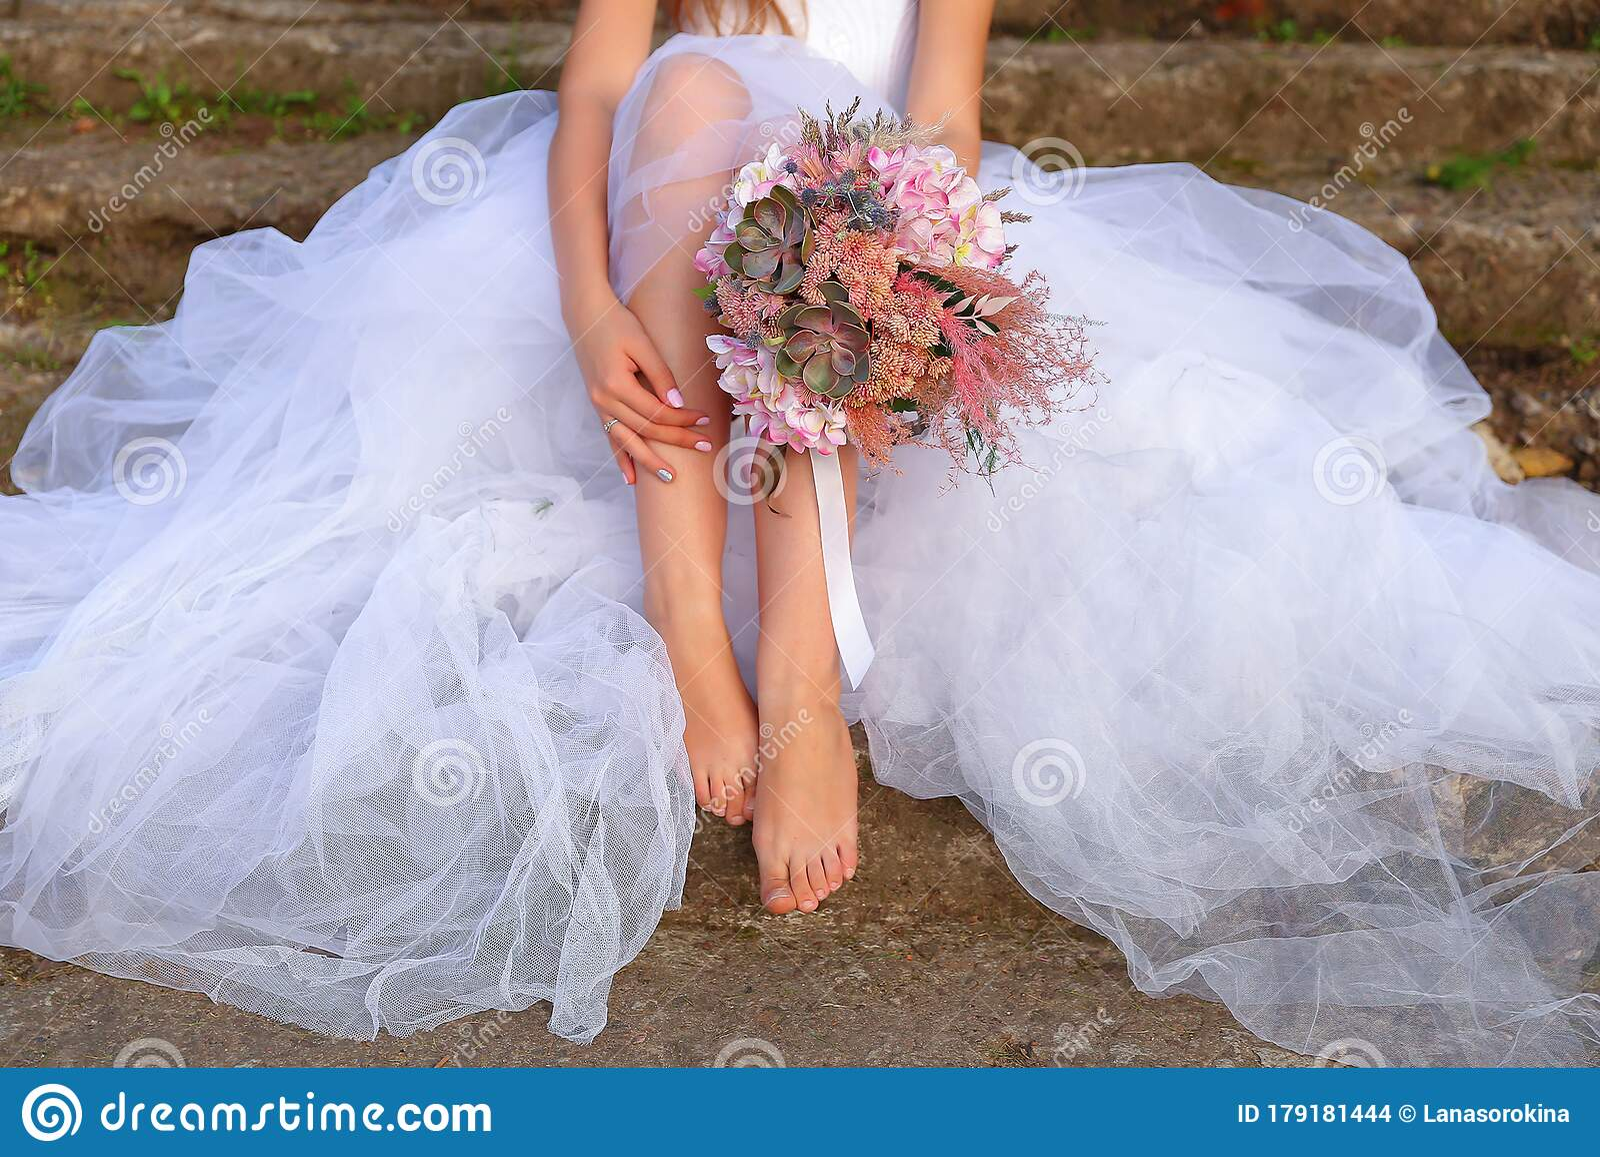 Bride Sitting On The Stone Steps And Holding Wedding Bouquet Stock Photo Image Of Beautiful Harmonious 179181444